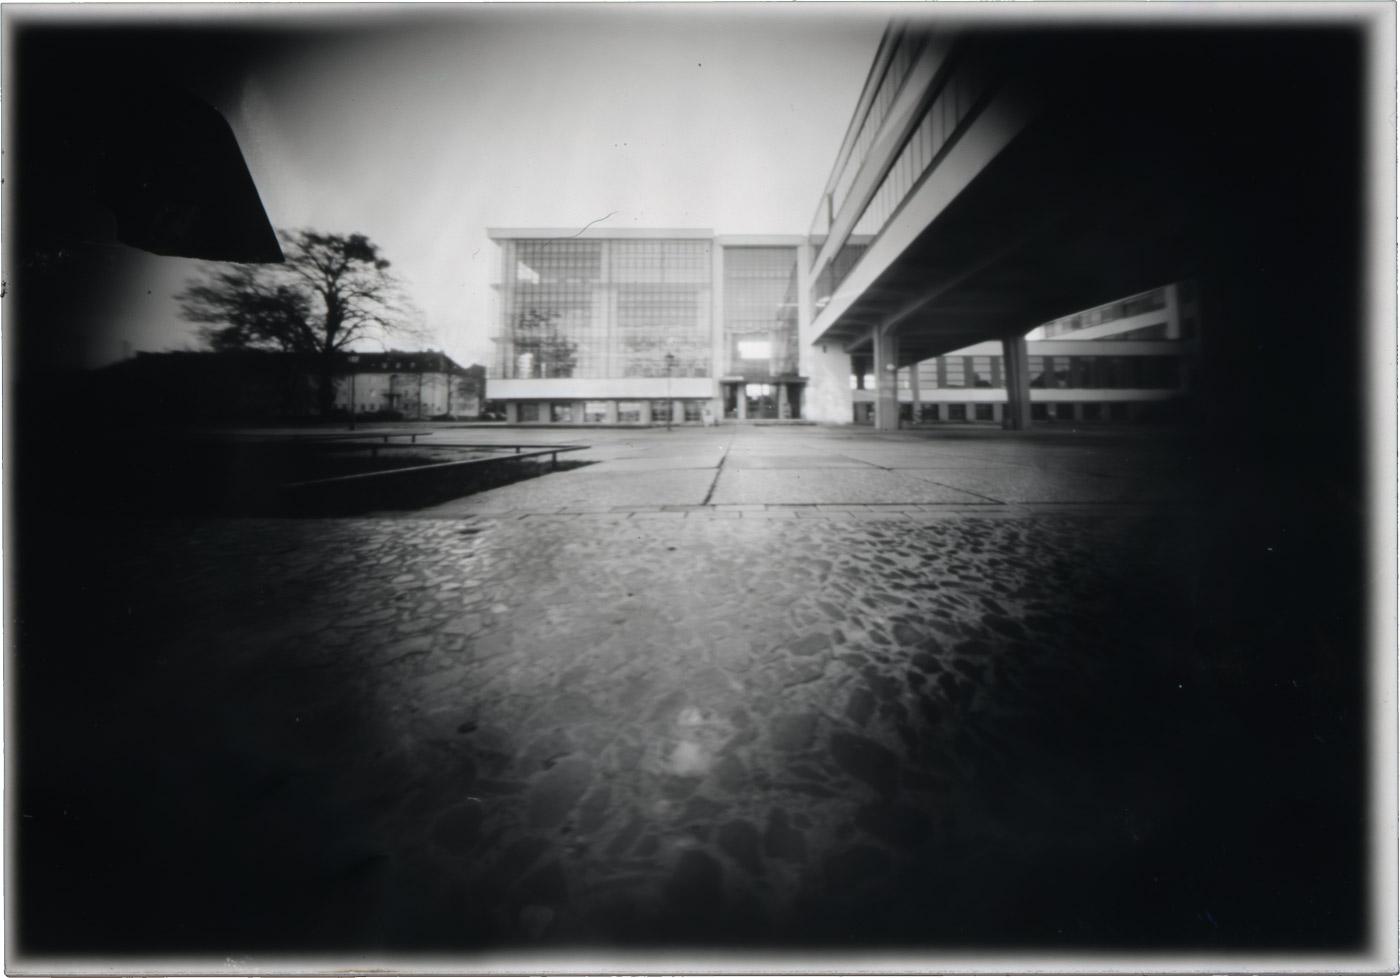 Camera Obscura - das Bauhaus Dessau als Fotomotiv für experimentelle Fotografie